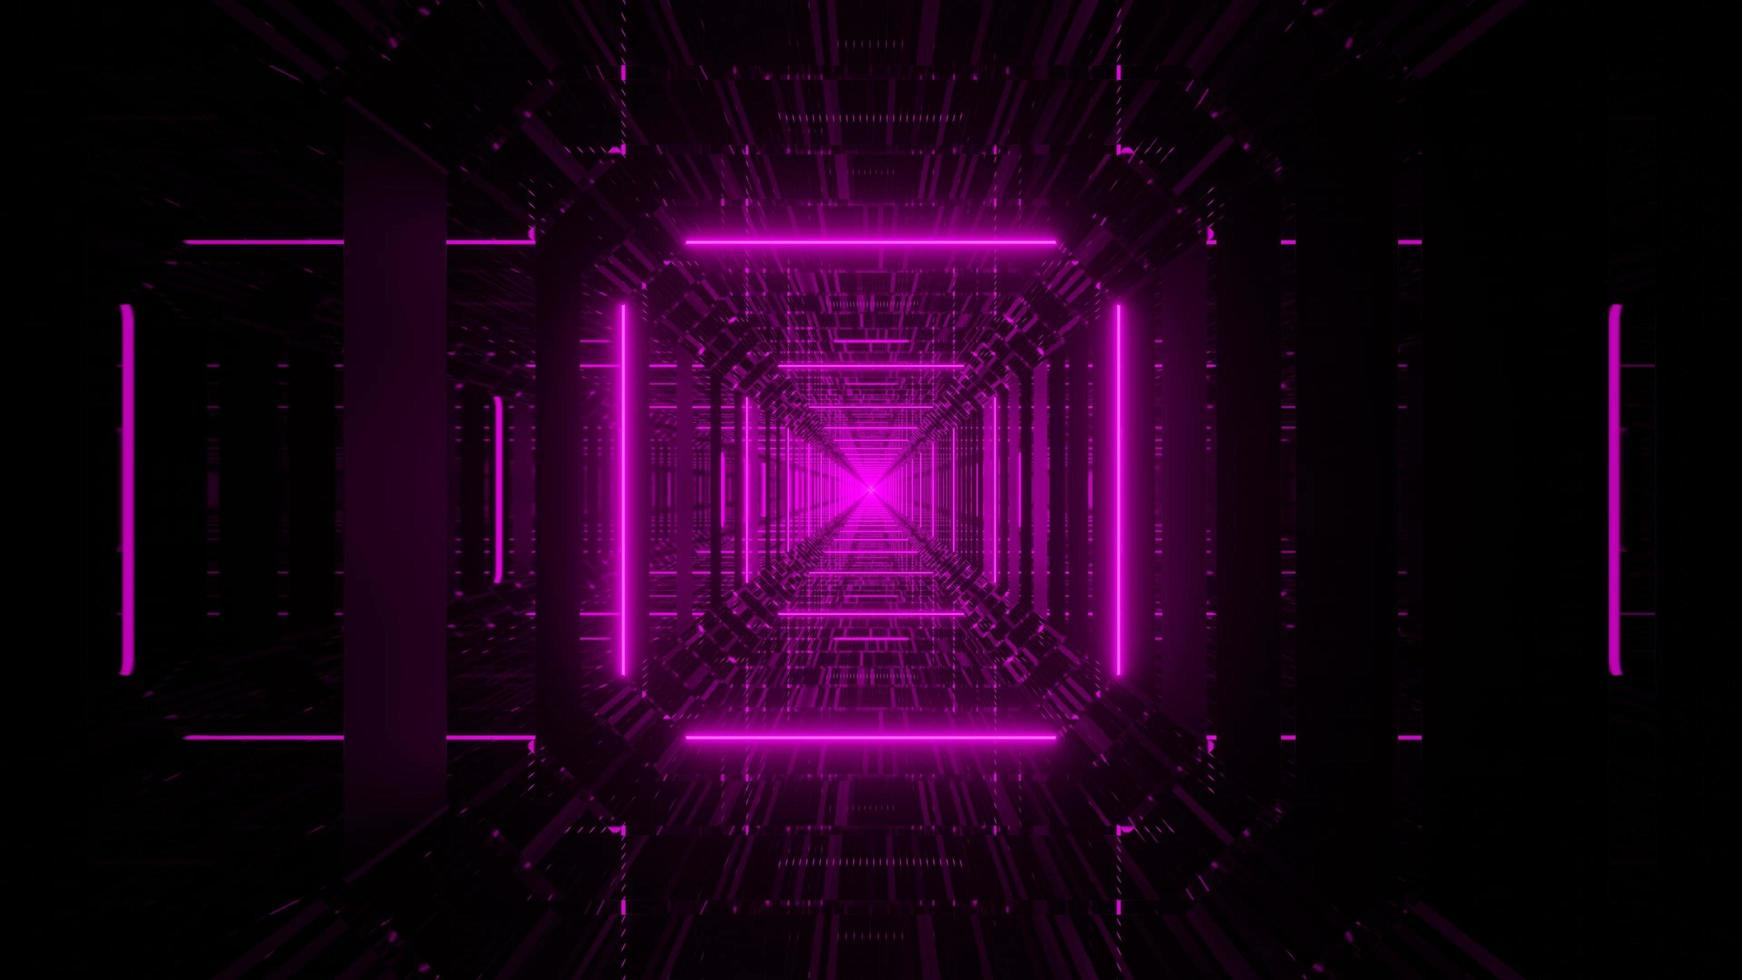 fond d'écran futuriste de science-fiction photo